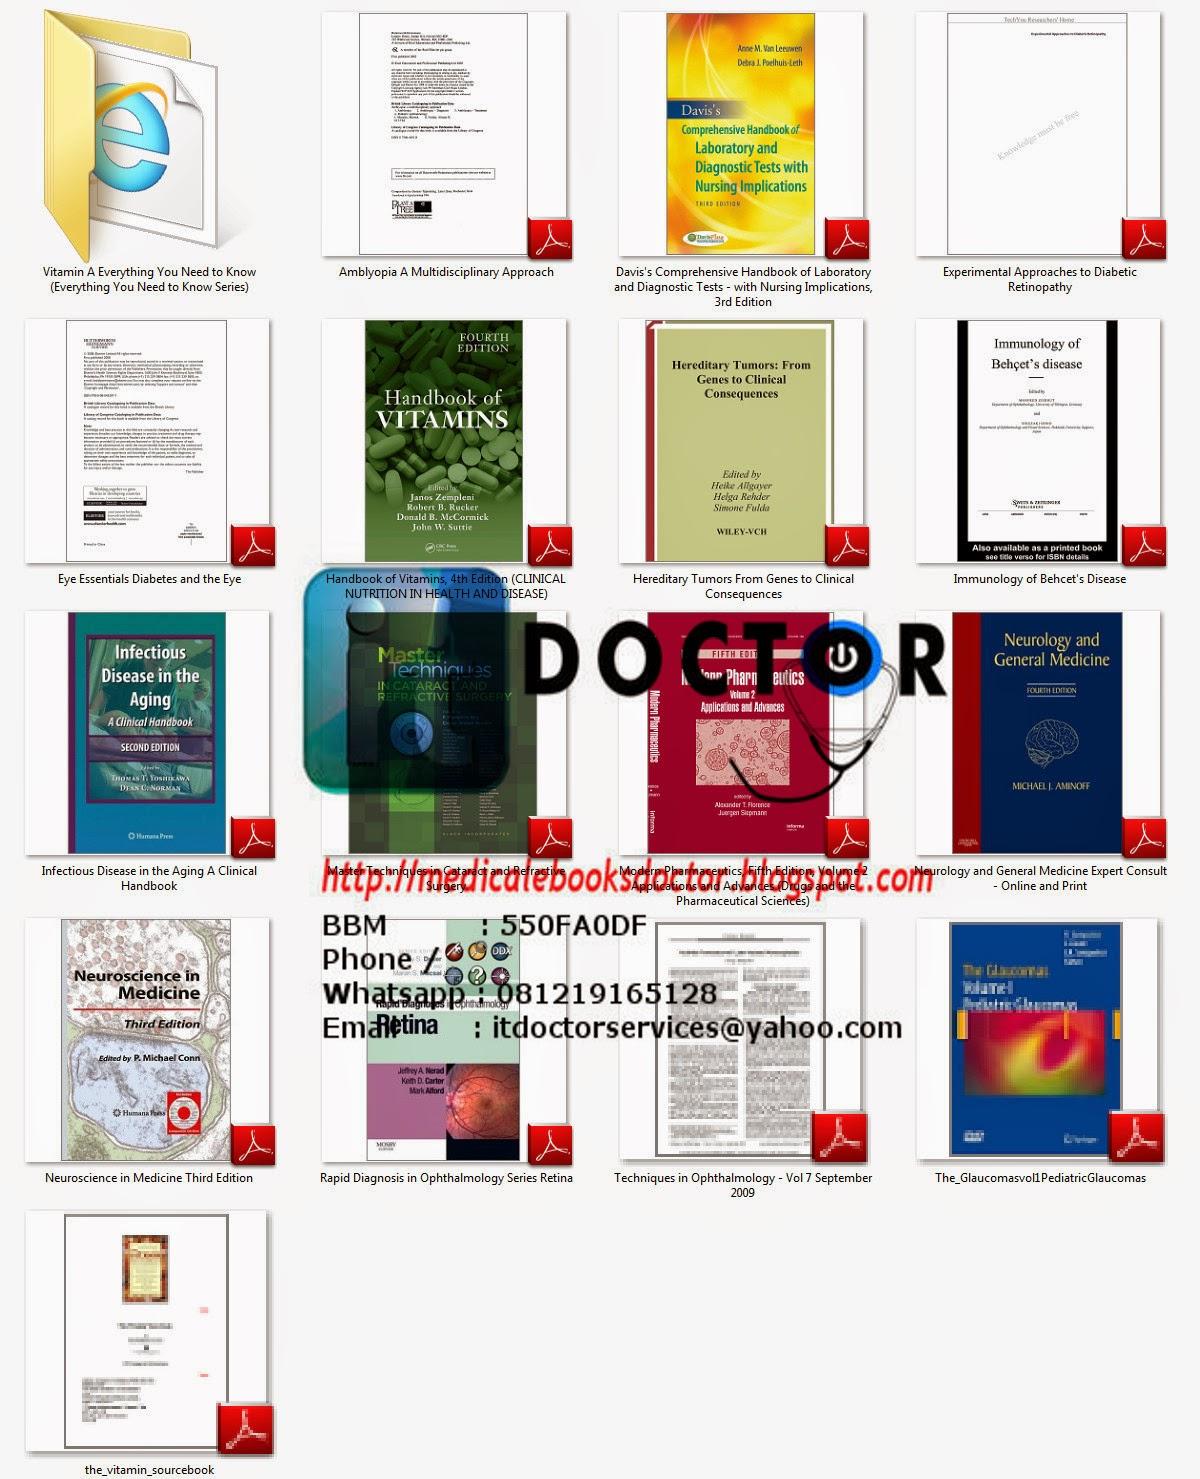 Medical ebooks doctor: OPHTHALMOLOGY EBOOKS Vol 1